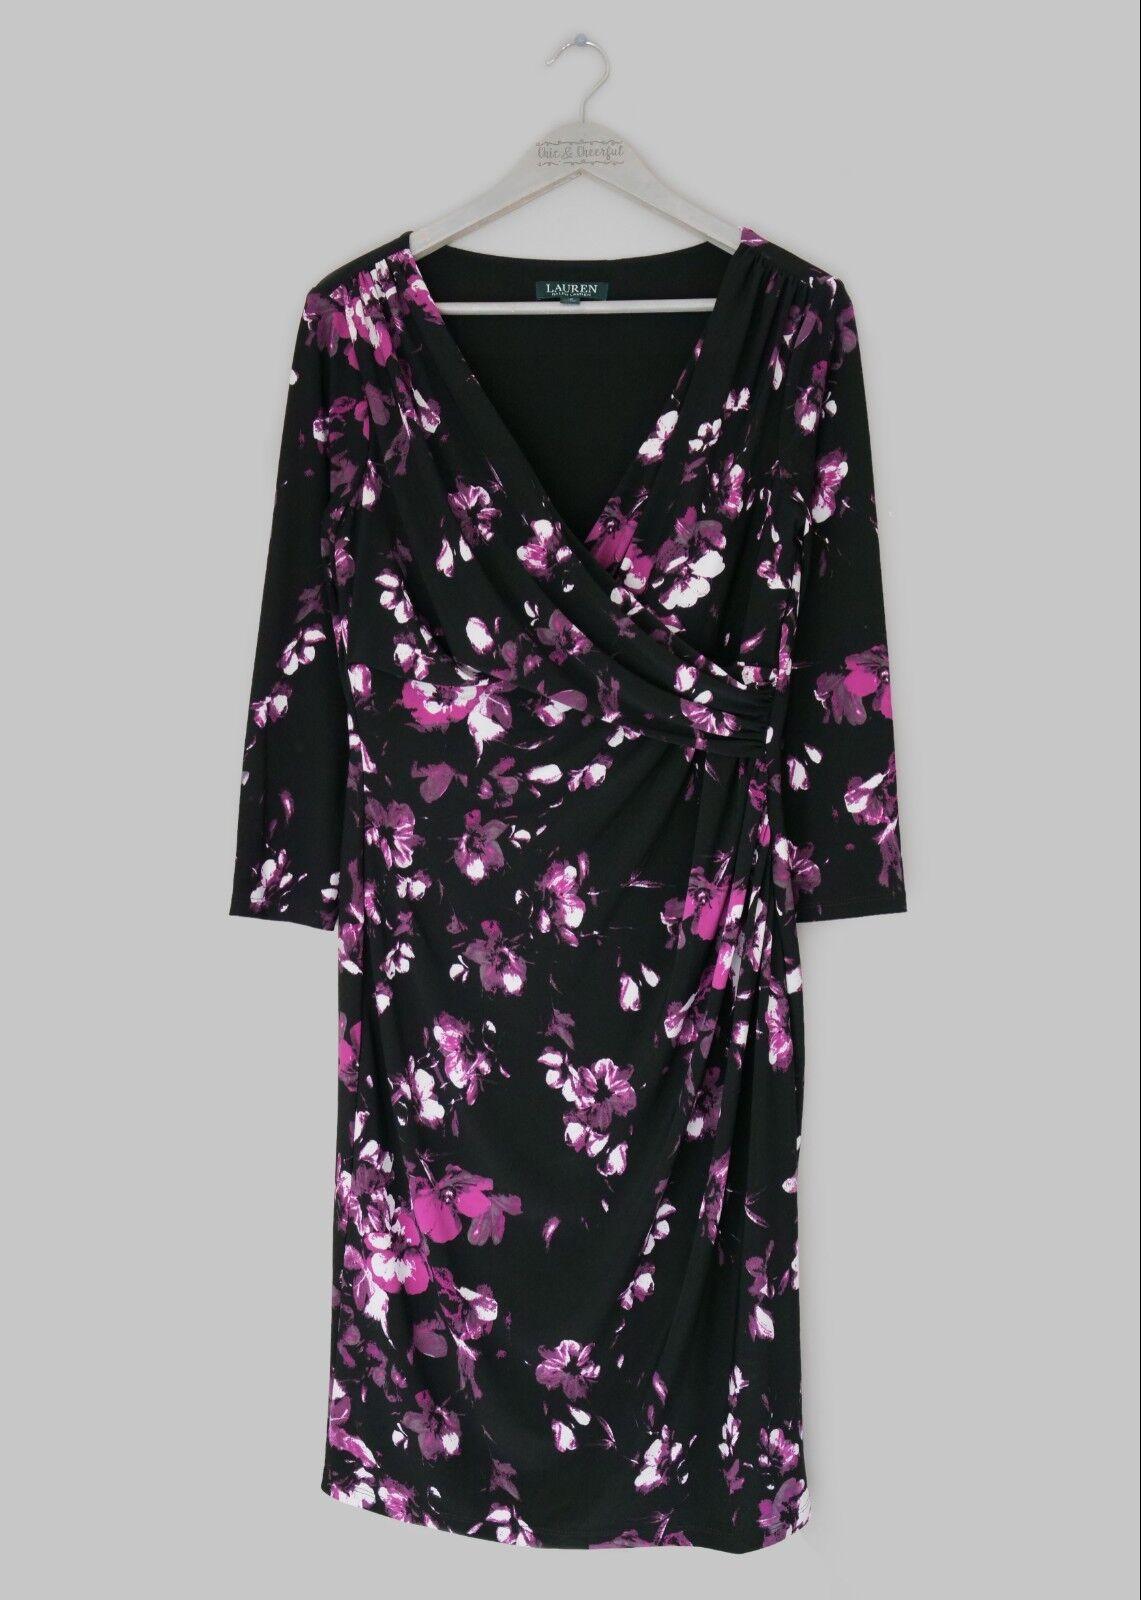 aa10976a0bcfb0 LAUREN LAUREN LAUREN RALPH LAUREN damen schwarz   lila FLORAL PRINT DRESS  -US 10 UK 14- 700a36